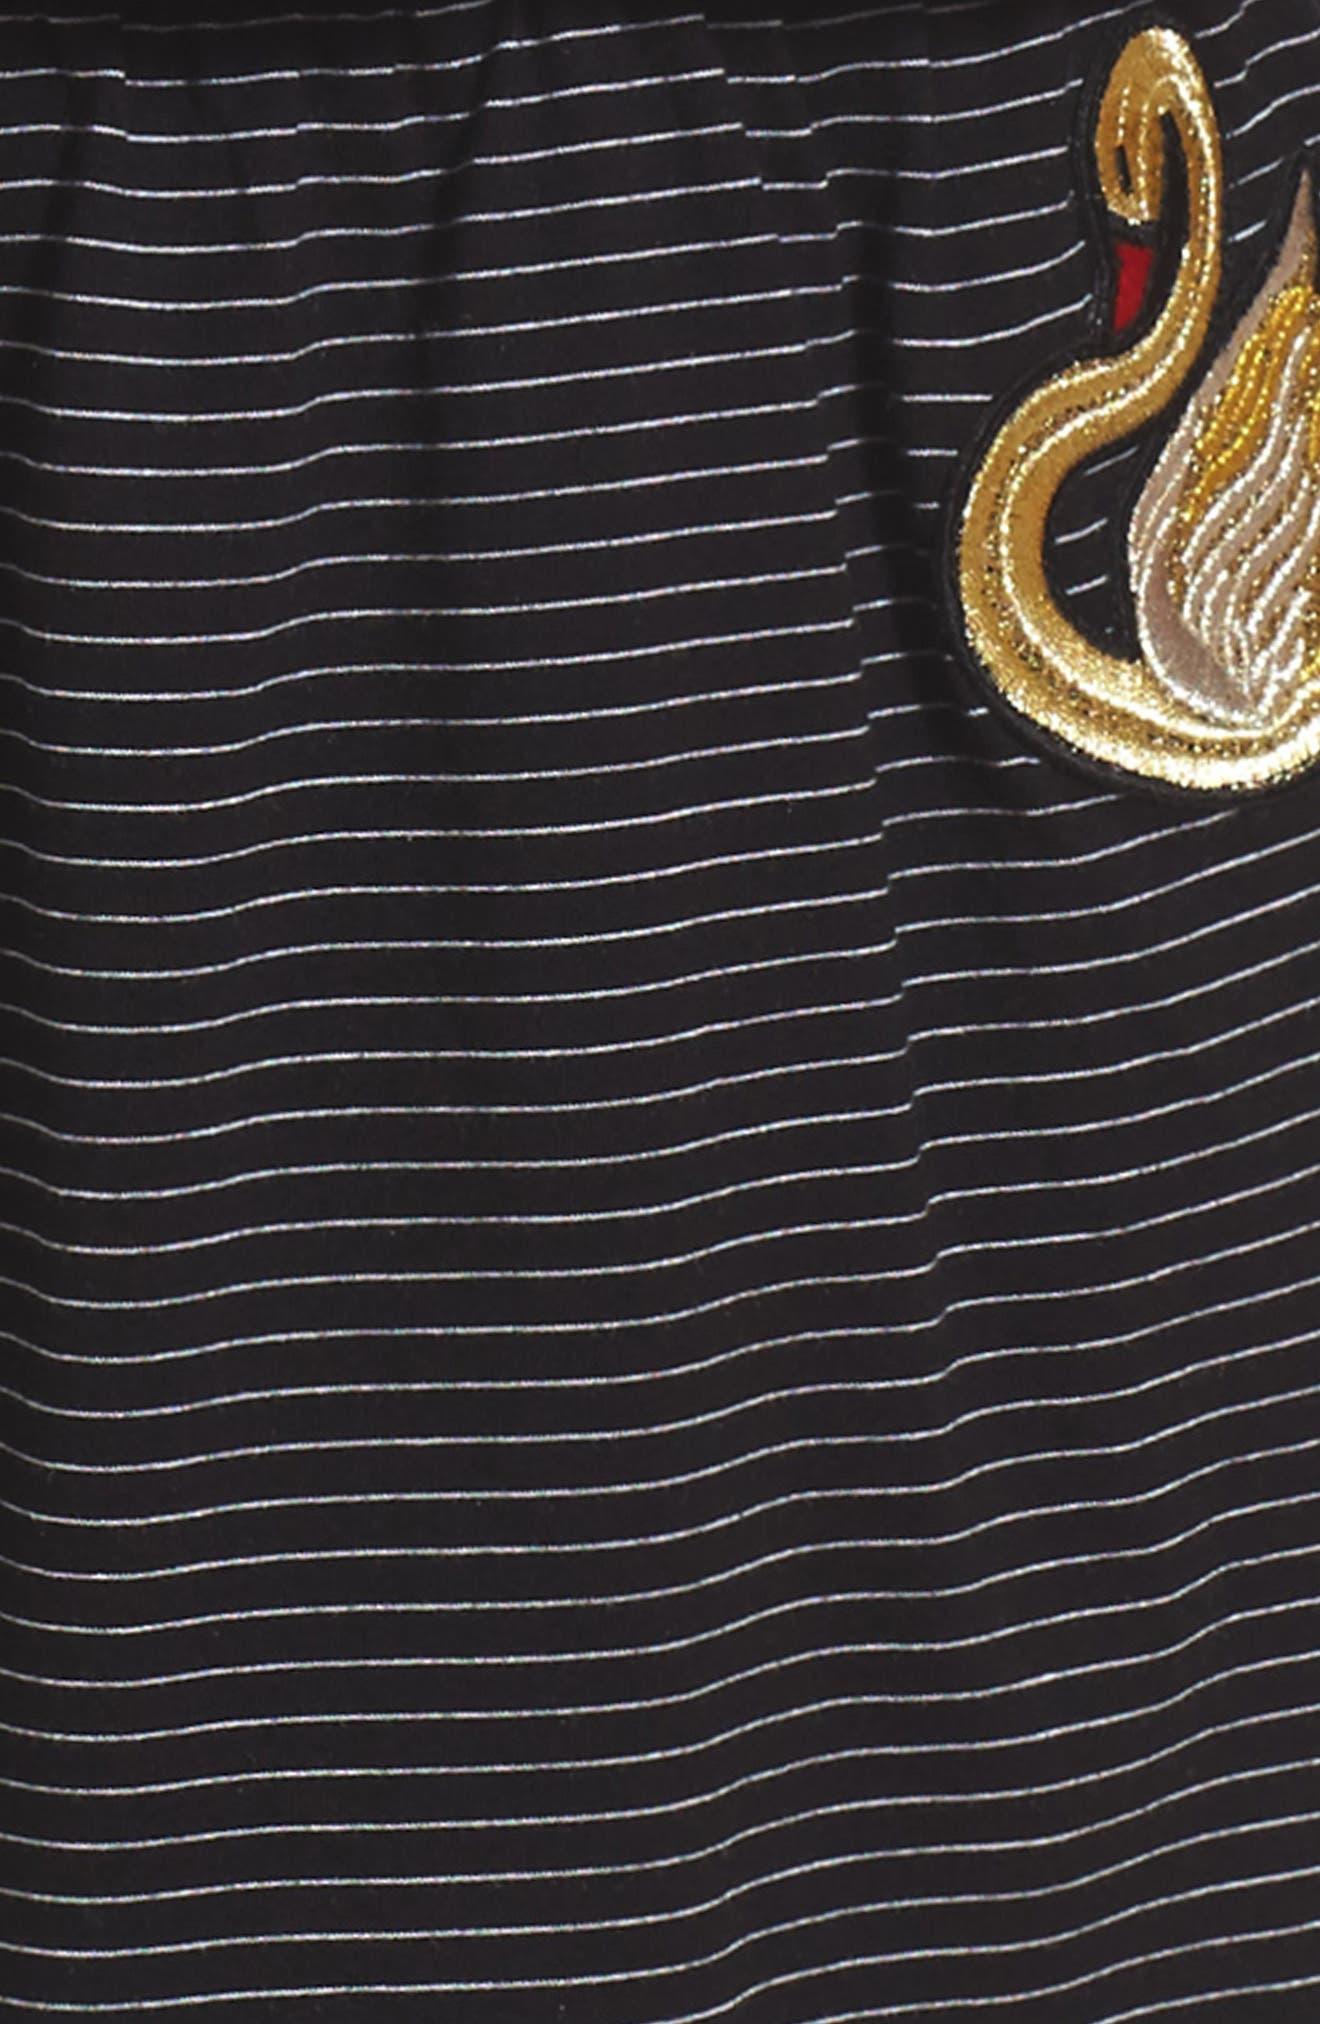 Swan Embroidered Blouson Dress,                             Alternate thumbnail 3, color,                             Black